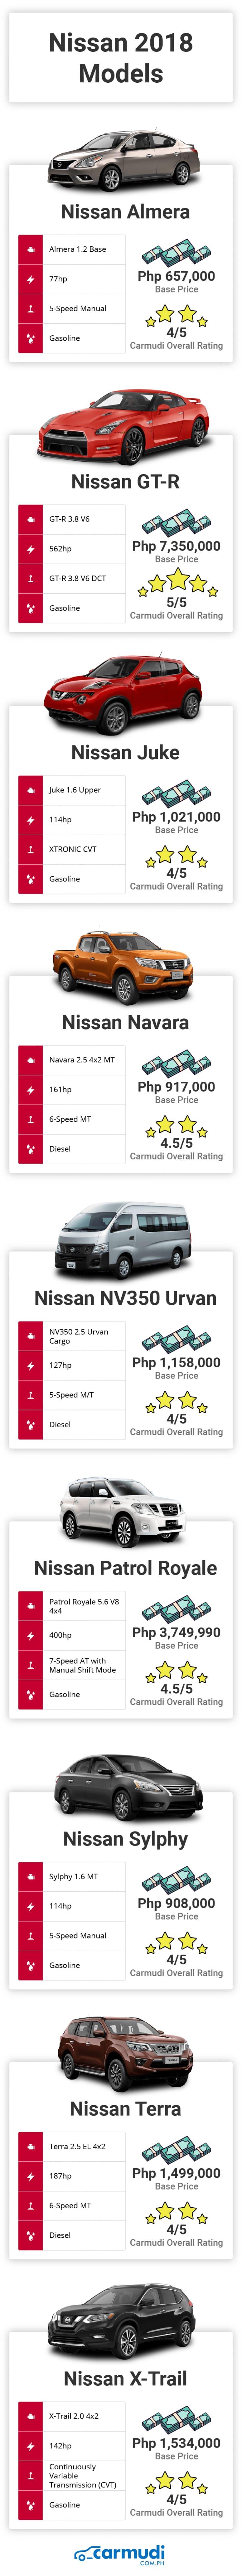 Brand-New Nissan 2018